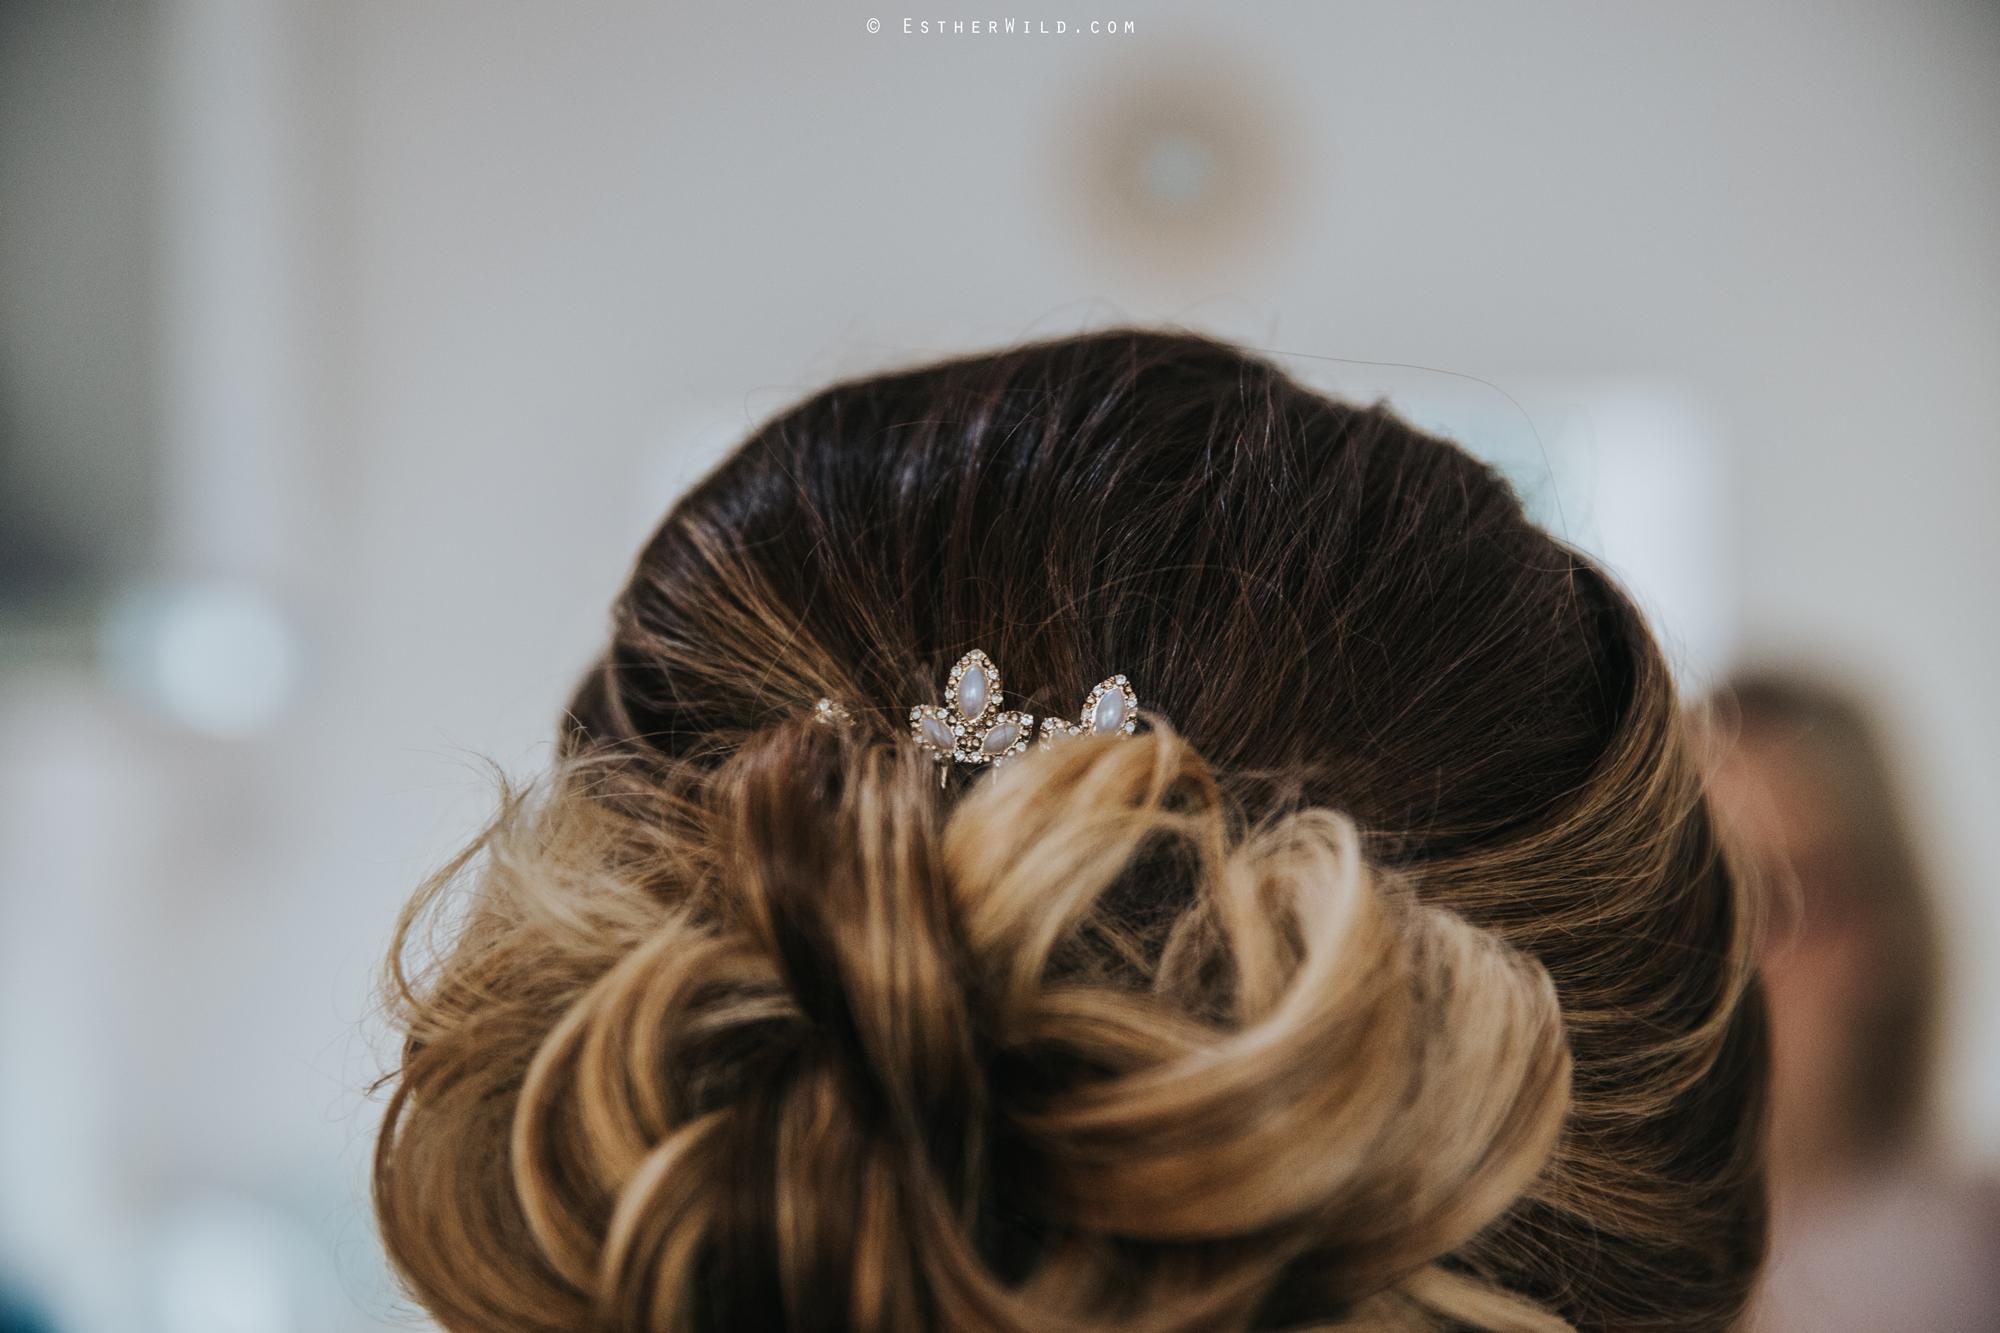 Reading_Room_Weddings_Alby_Norwich_Photographer_Esther_Wild_IMG_0268.jpg